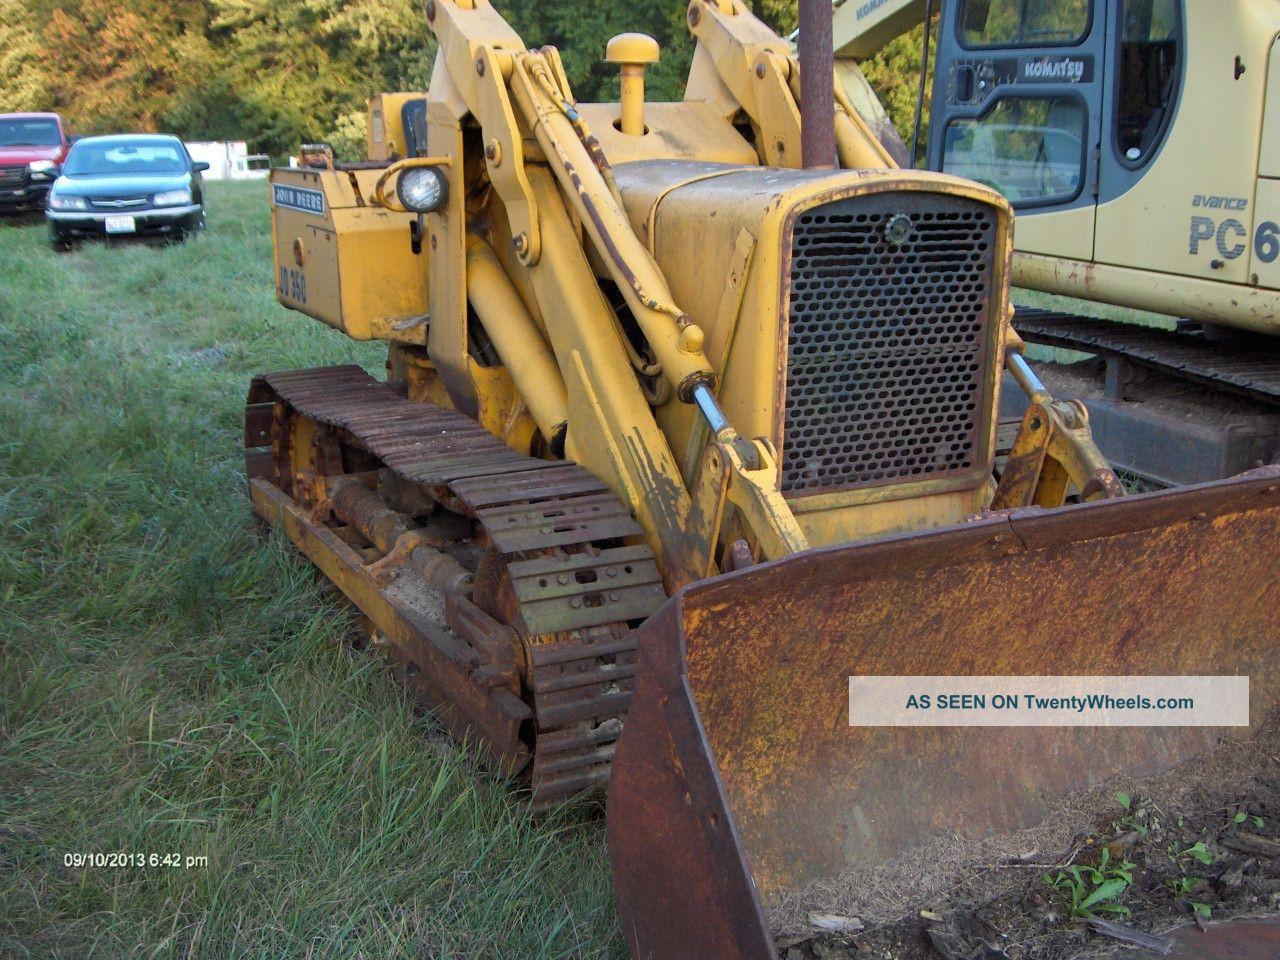 John Deere 350 Crawler Loader, Gas, Needs Tlc